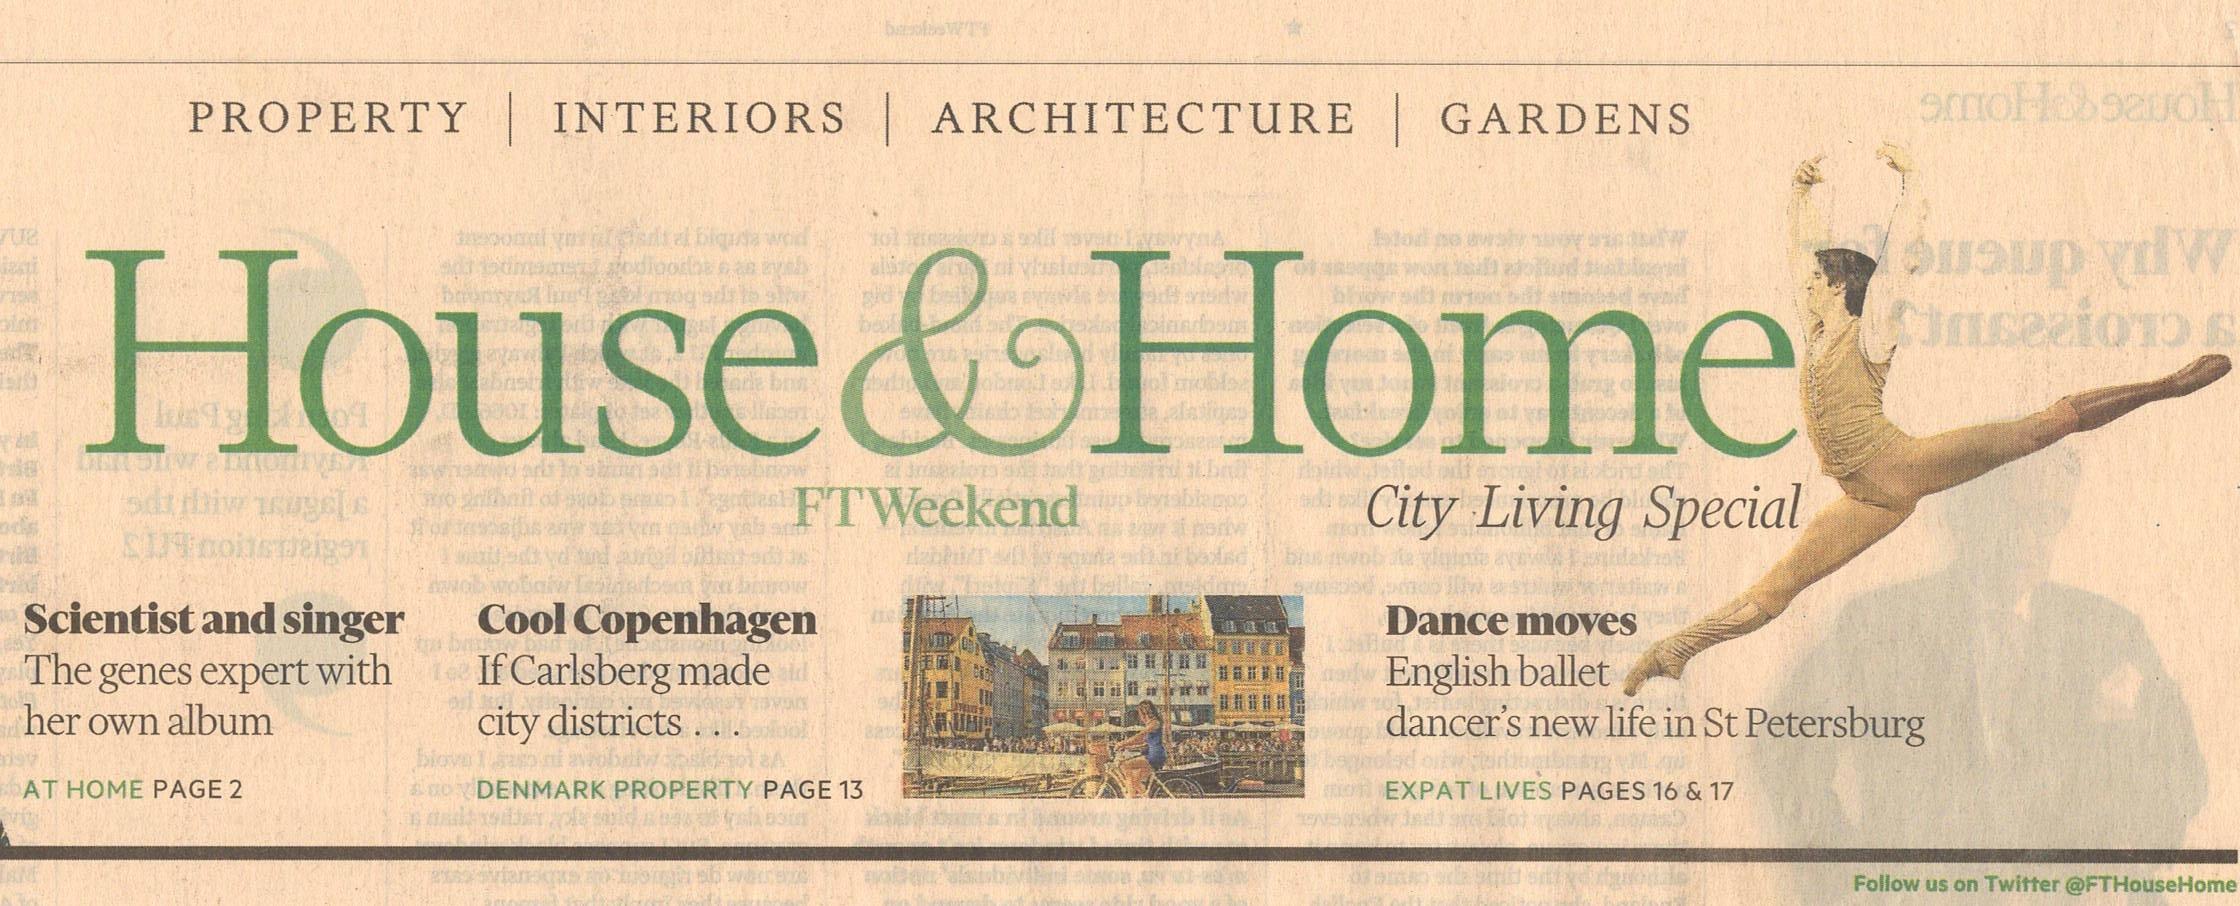 Financial Times 9 May 2015